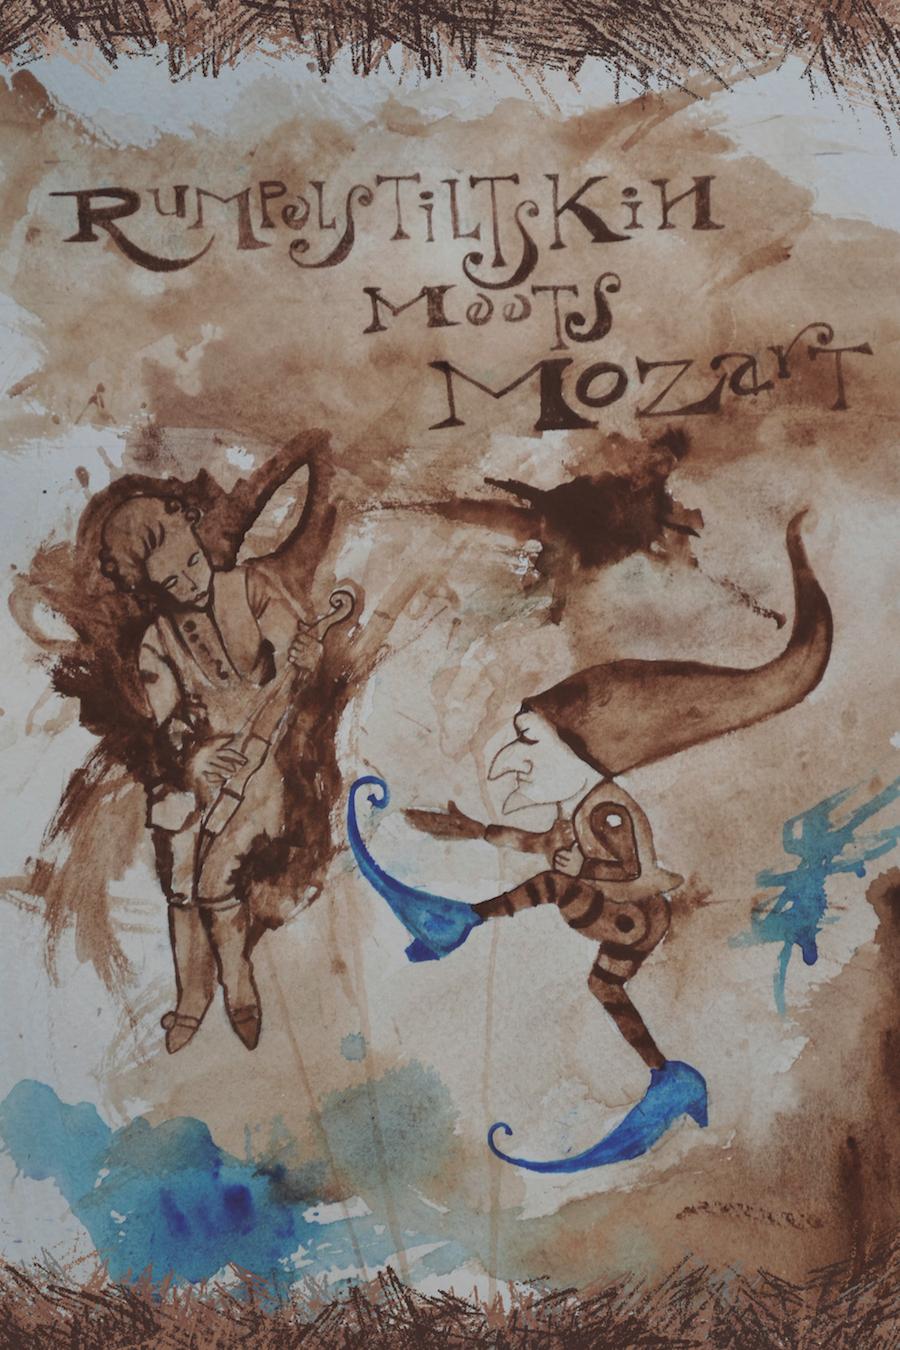 Rumpelstiltskin Meets Mozart Luis Macias